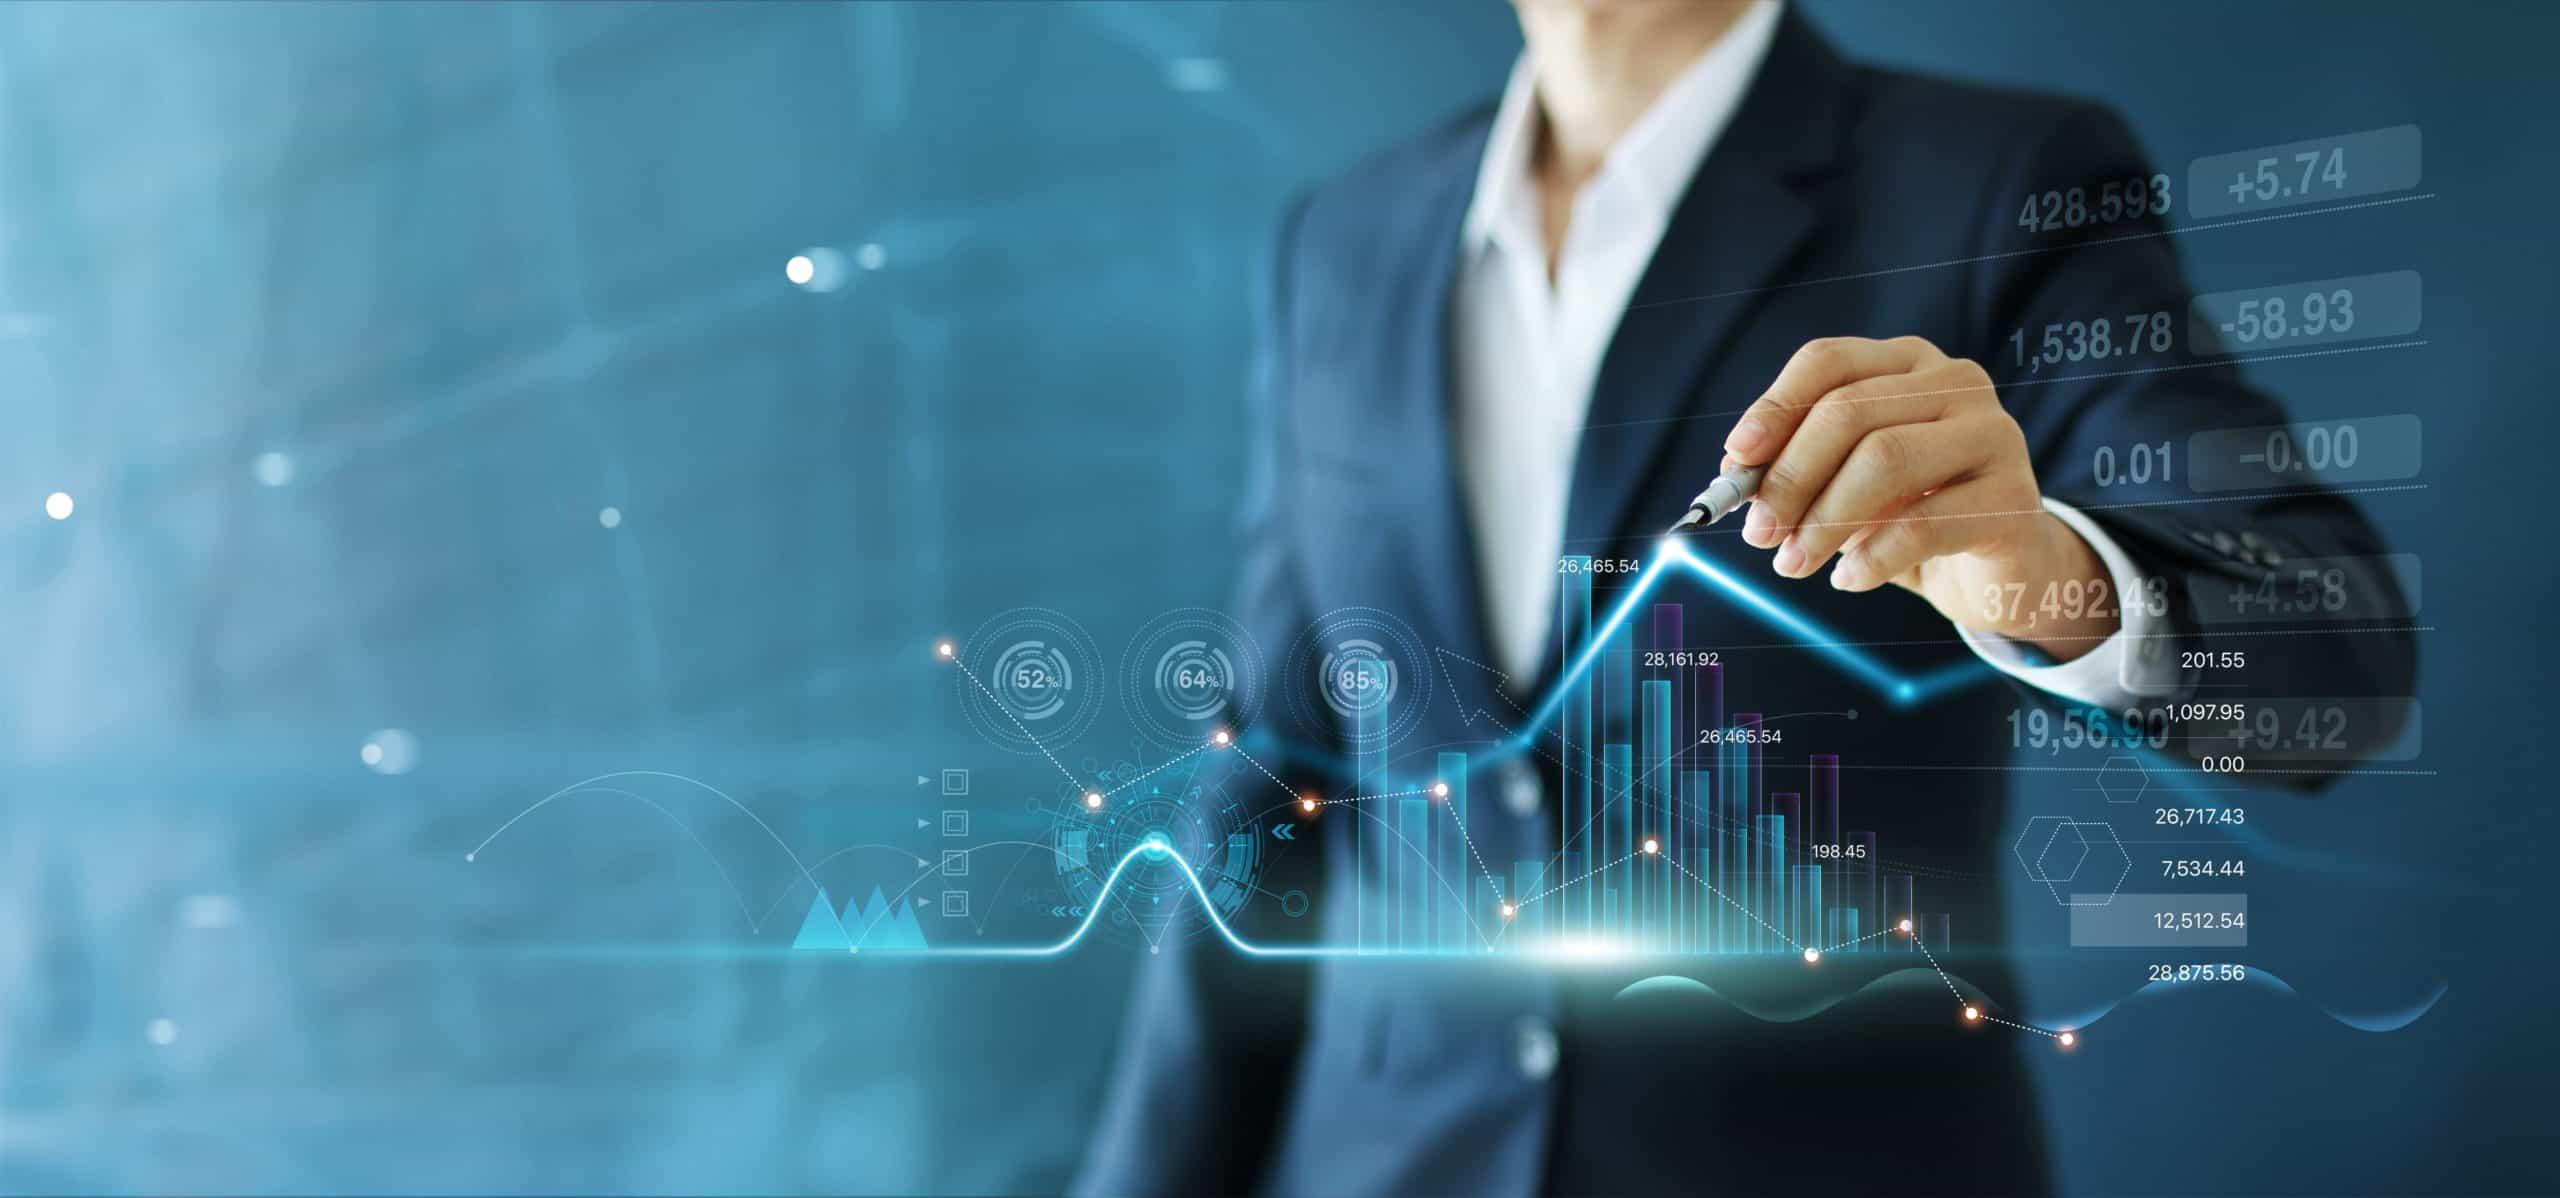 Digital Banking Market Growth